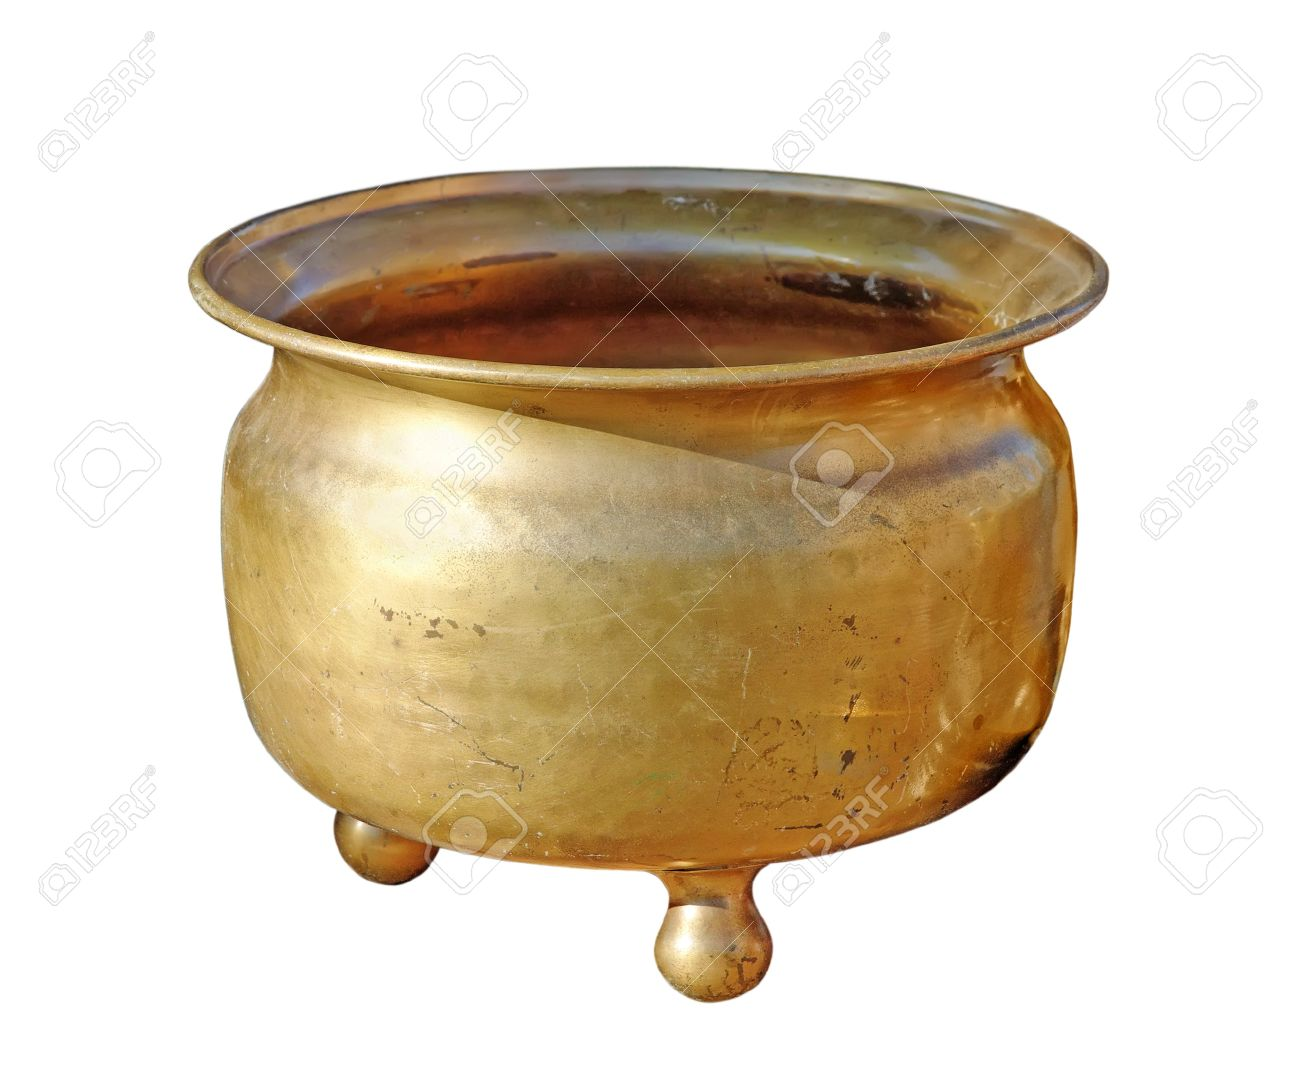 Antique copper chamber-pot - 10401081